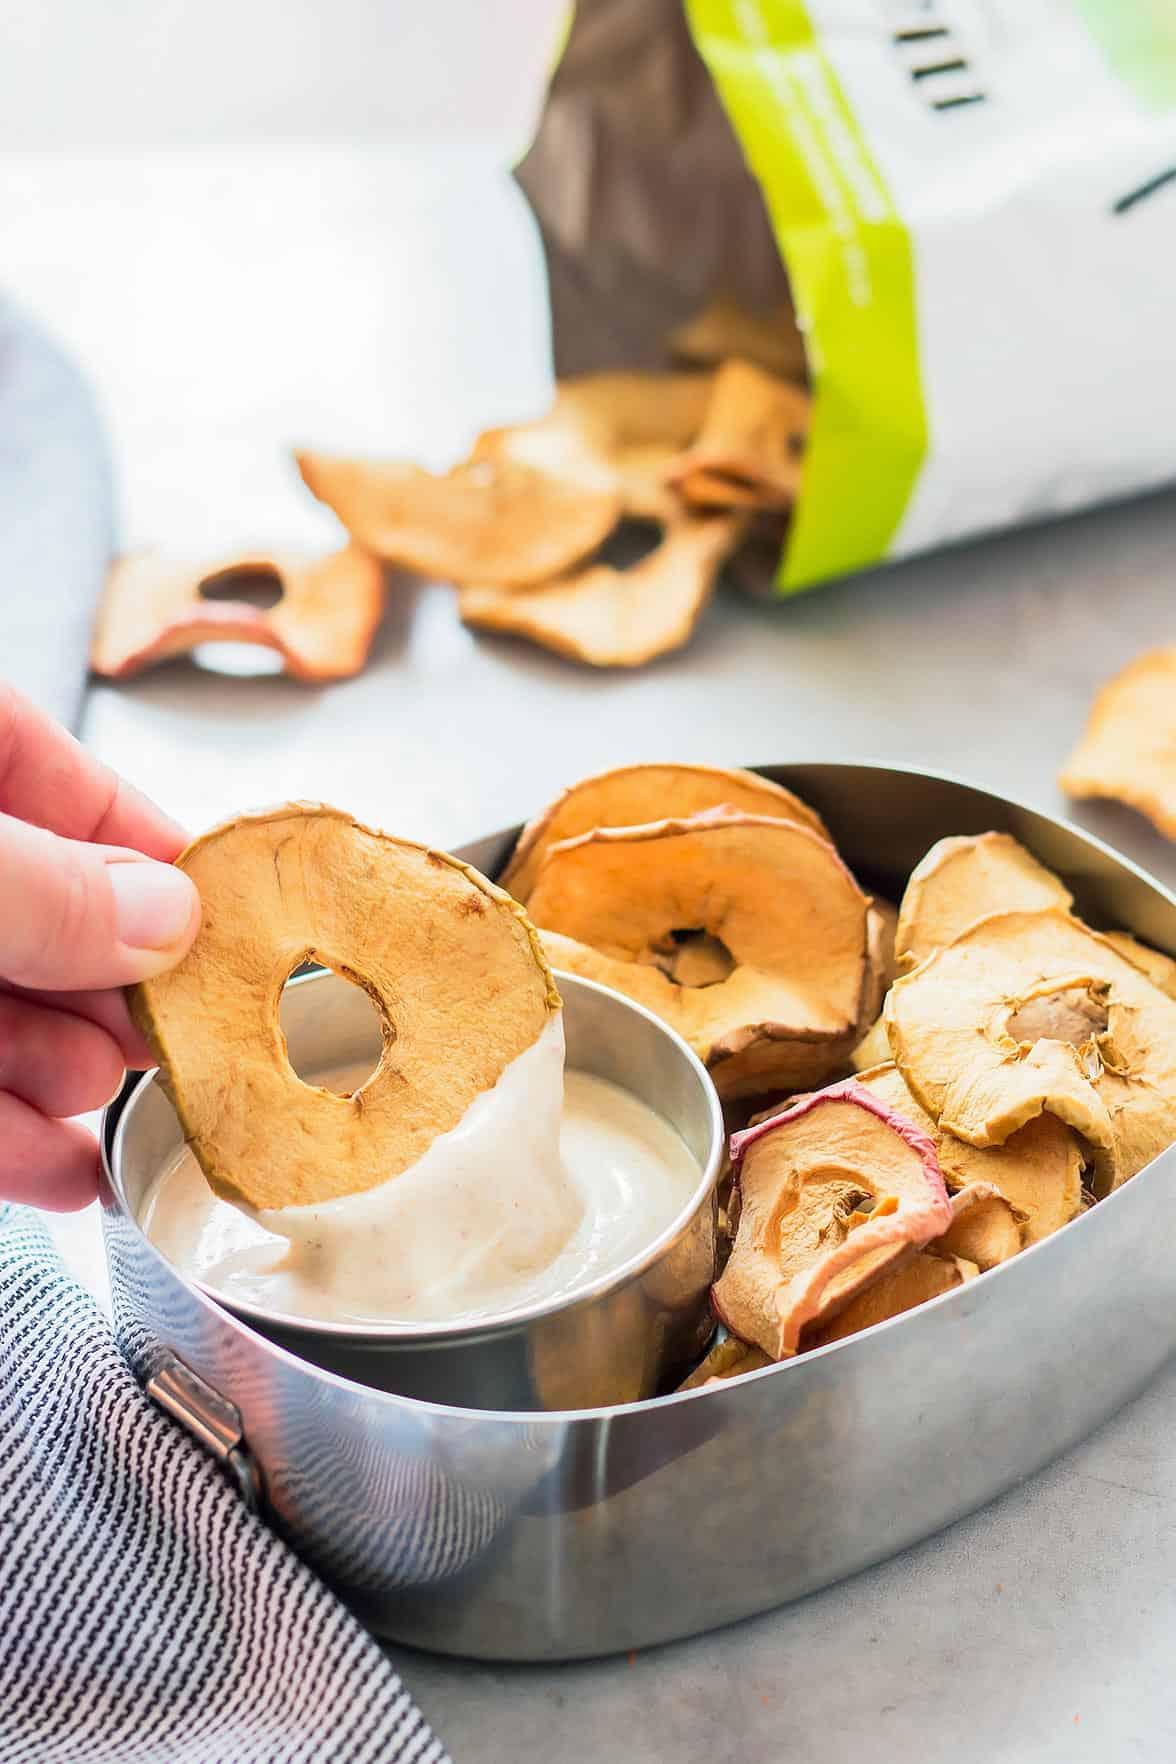 Healthy Fruit Dip with Greek Yogurt in lunch box